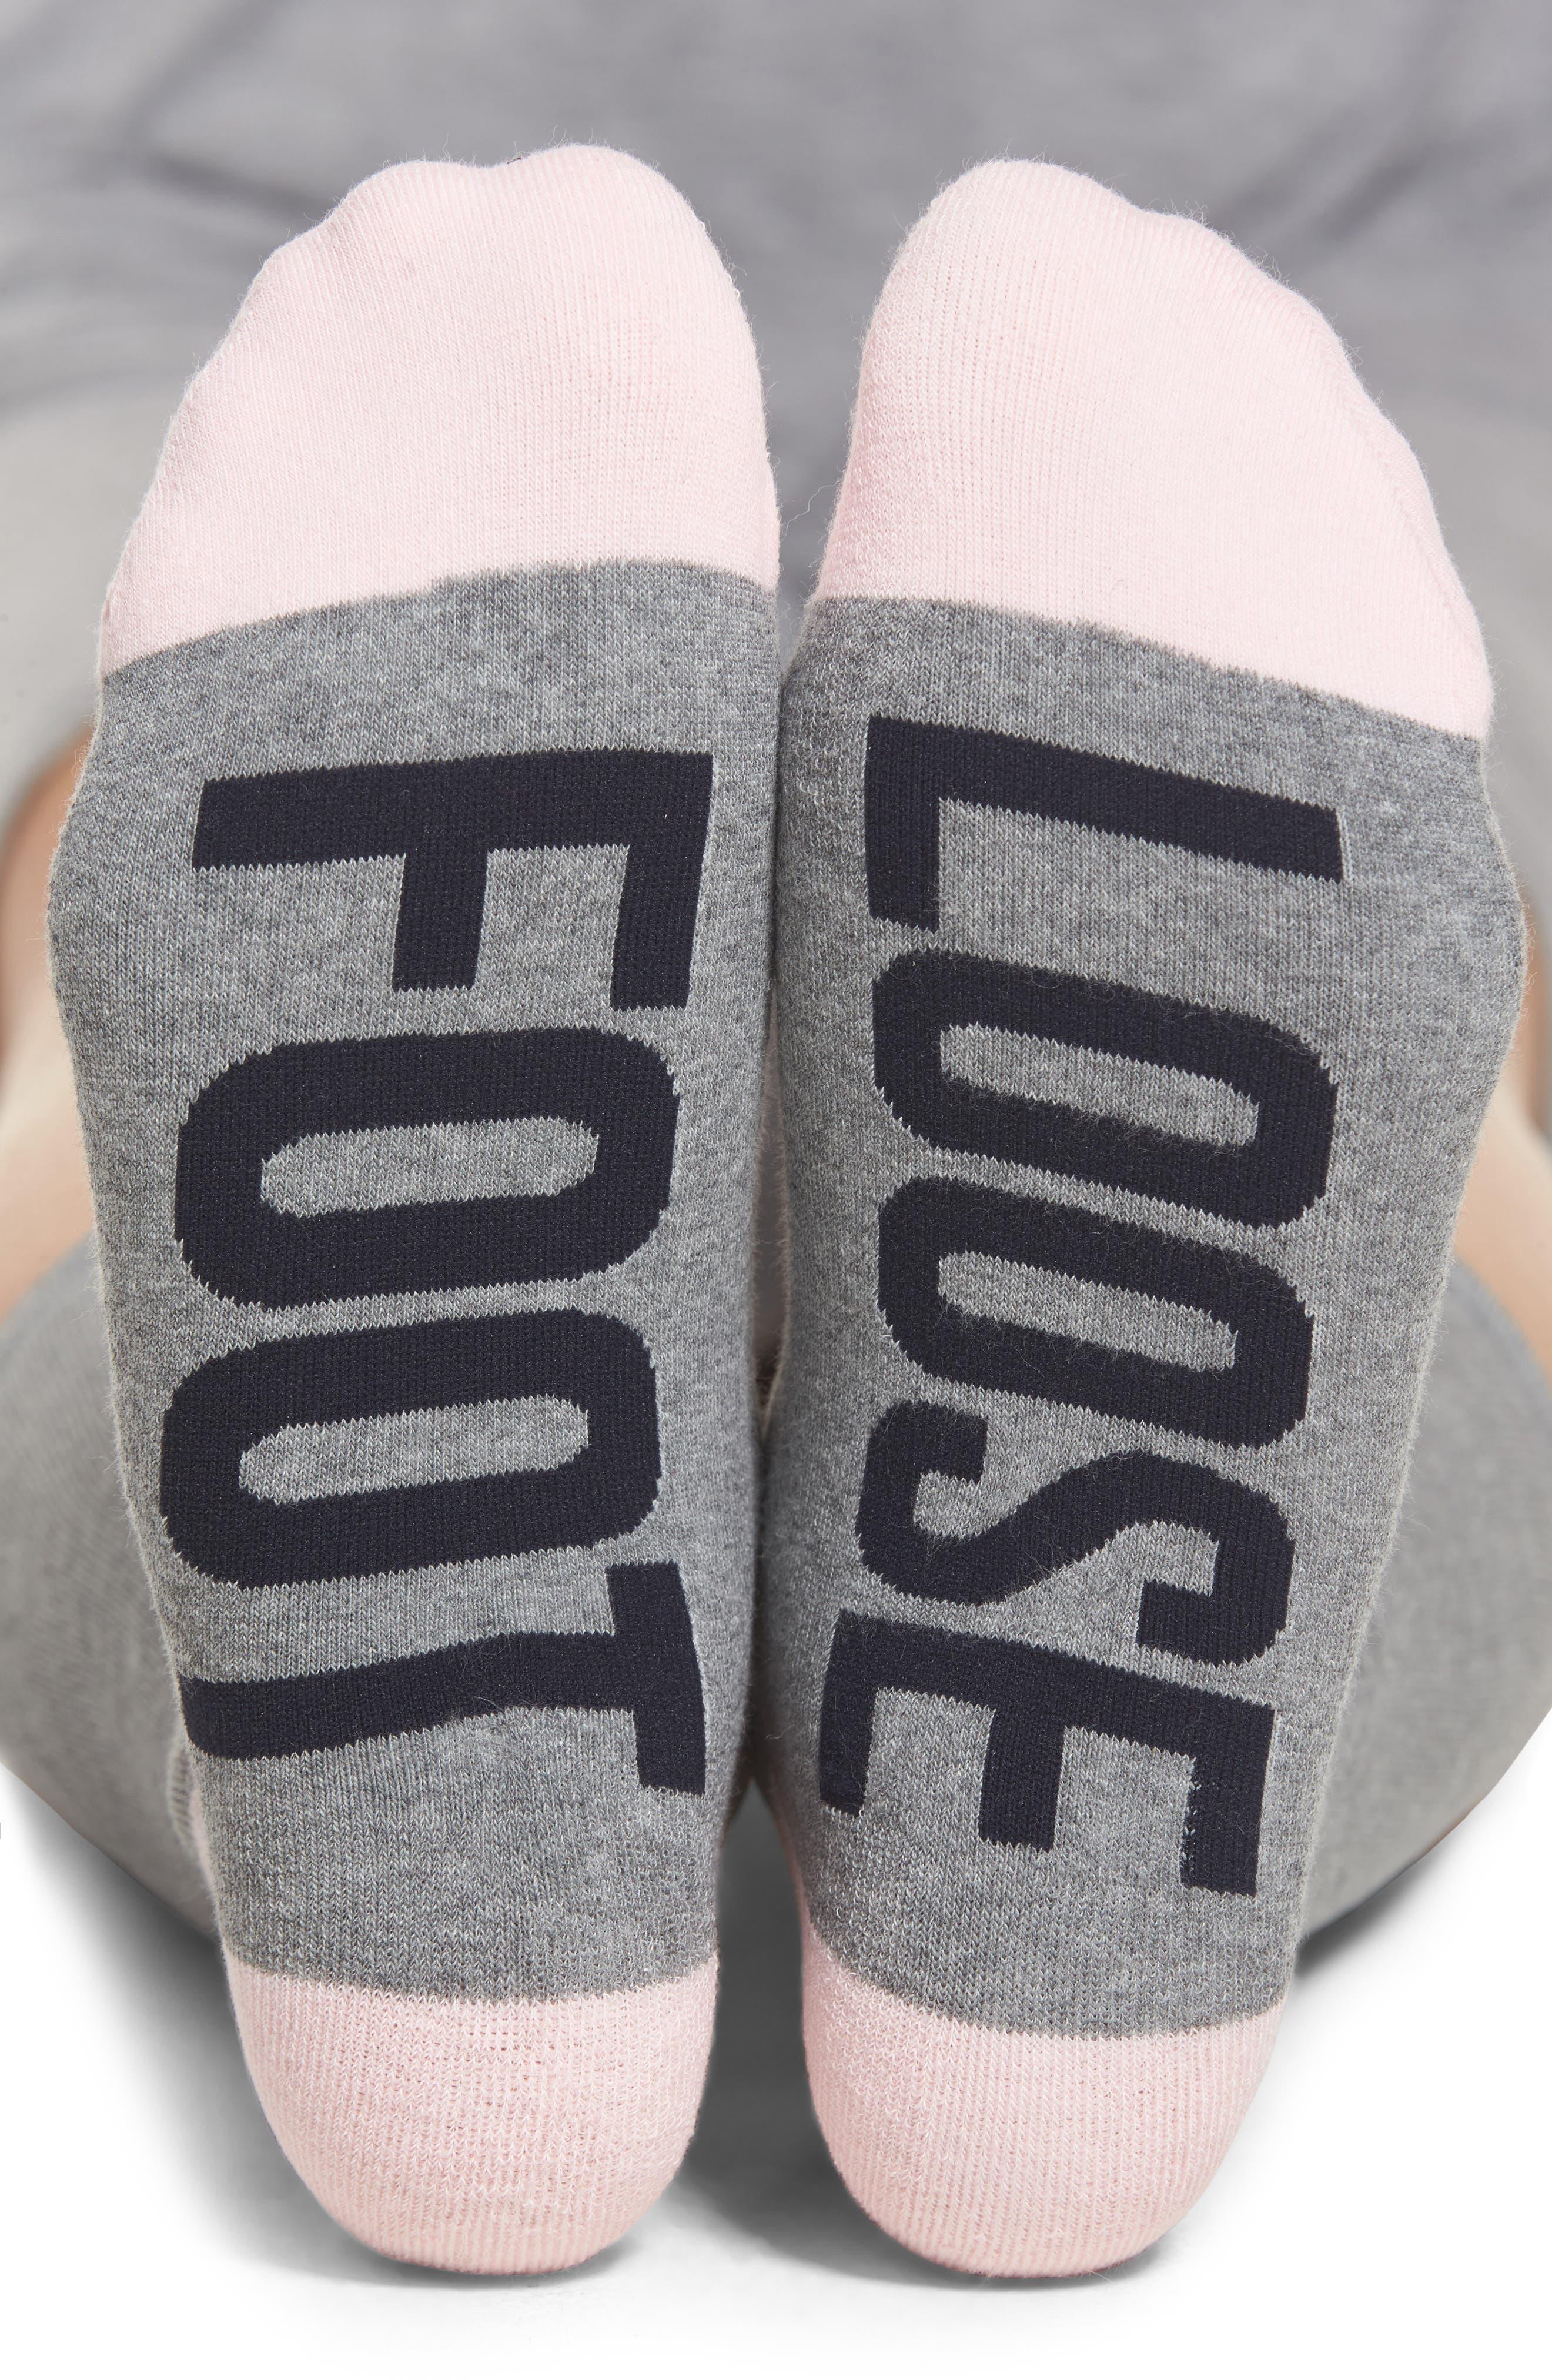 Foot Loose Crew Socks,                         Main,                         color, Grey Heather